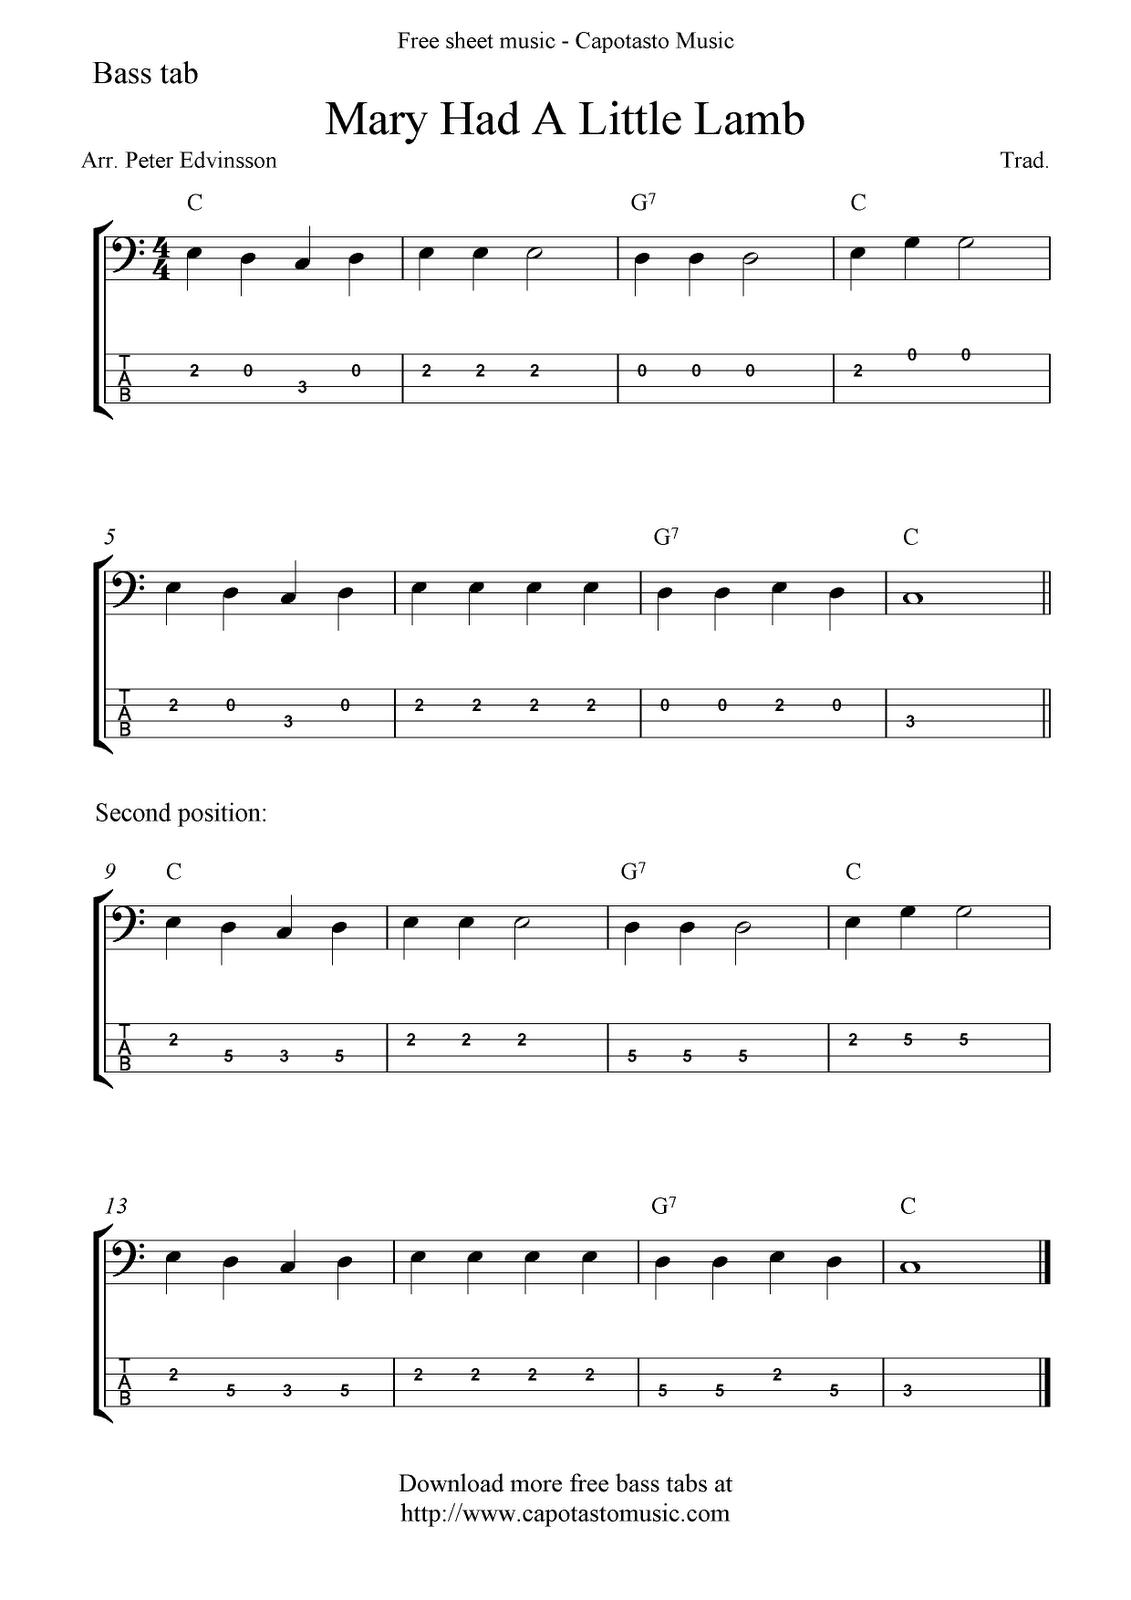 Guitar songs for beginners mary had a littel lamb free bass tab sheet music